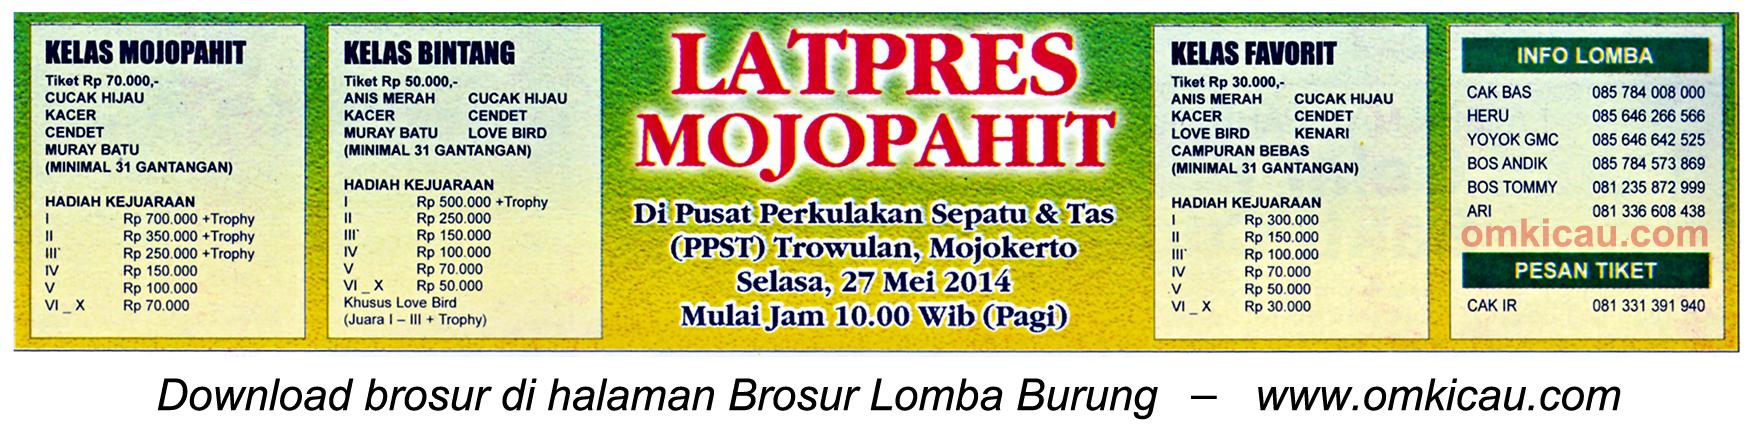 Brosur Latpres Burung Berkicau Mojopahit, Mojokerto, 27 Mei 2014